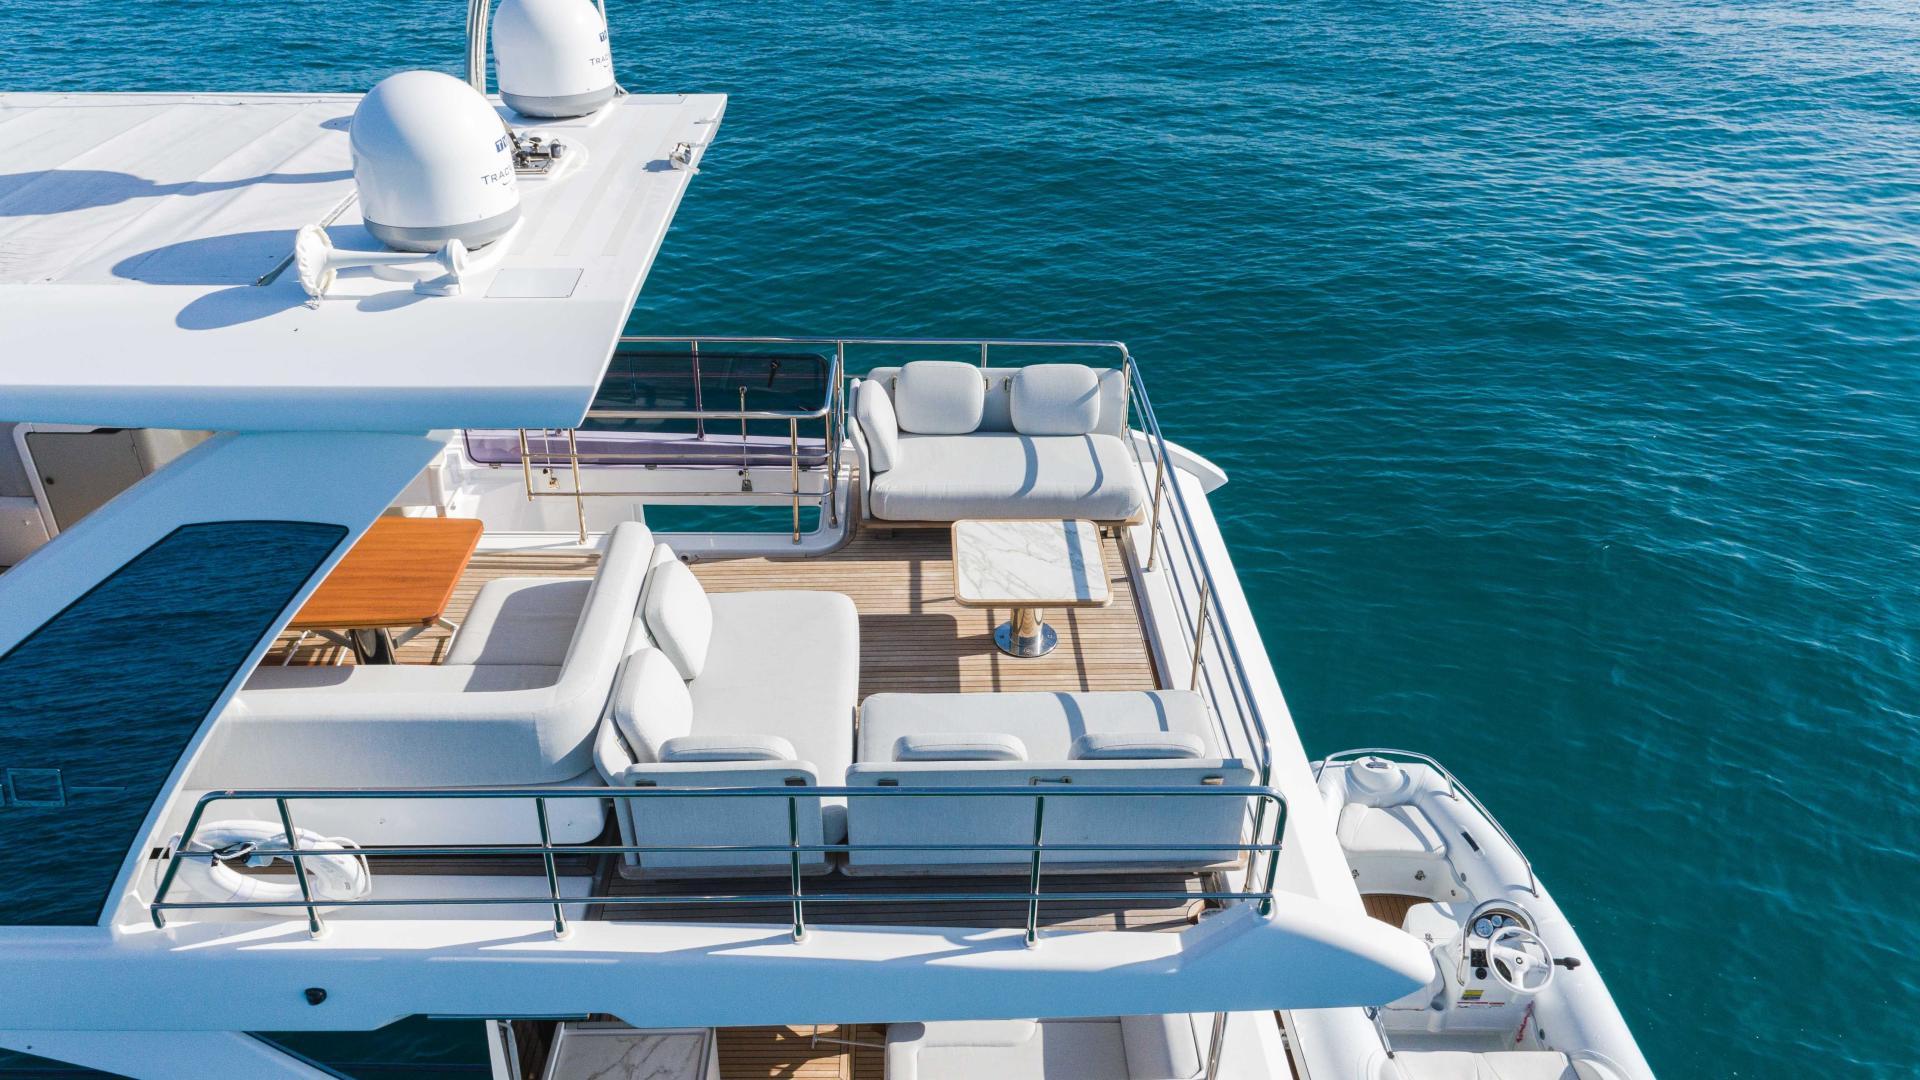 Azimut-60 Fly 2019-Still Dreaming Fisher Island-Florida-United States-1322727 | Thumbnail